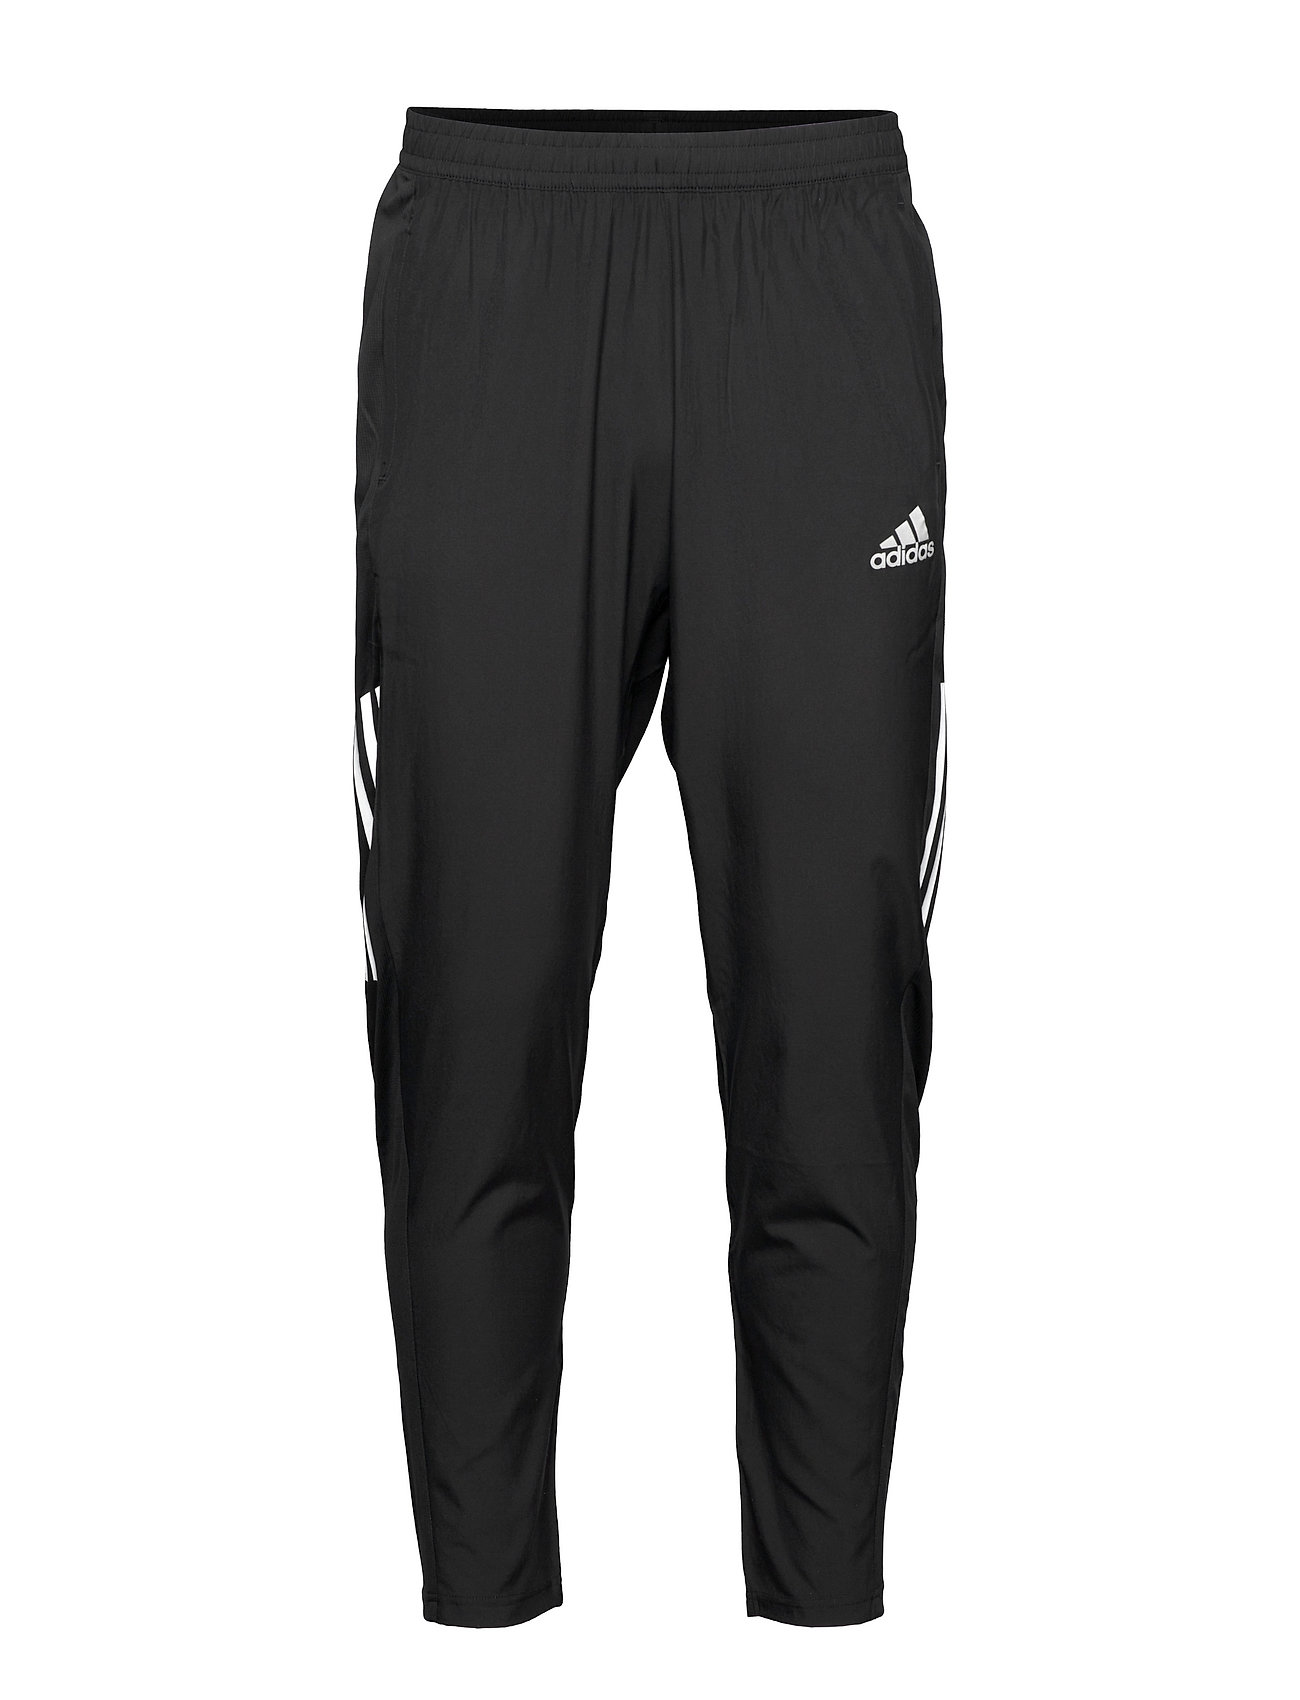 Own The Run Astro Wind Pants Sport Pants Sort Adidas Performance